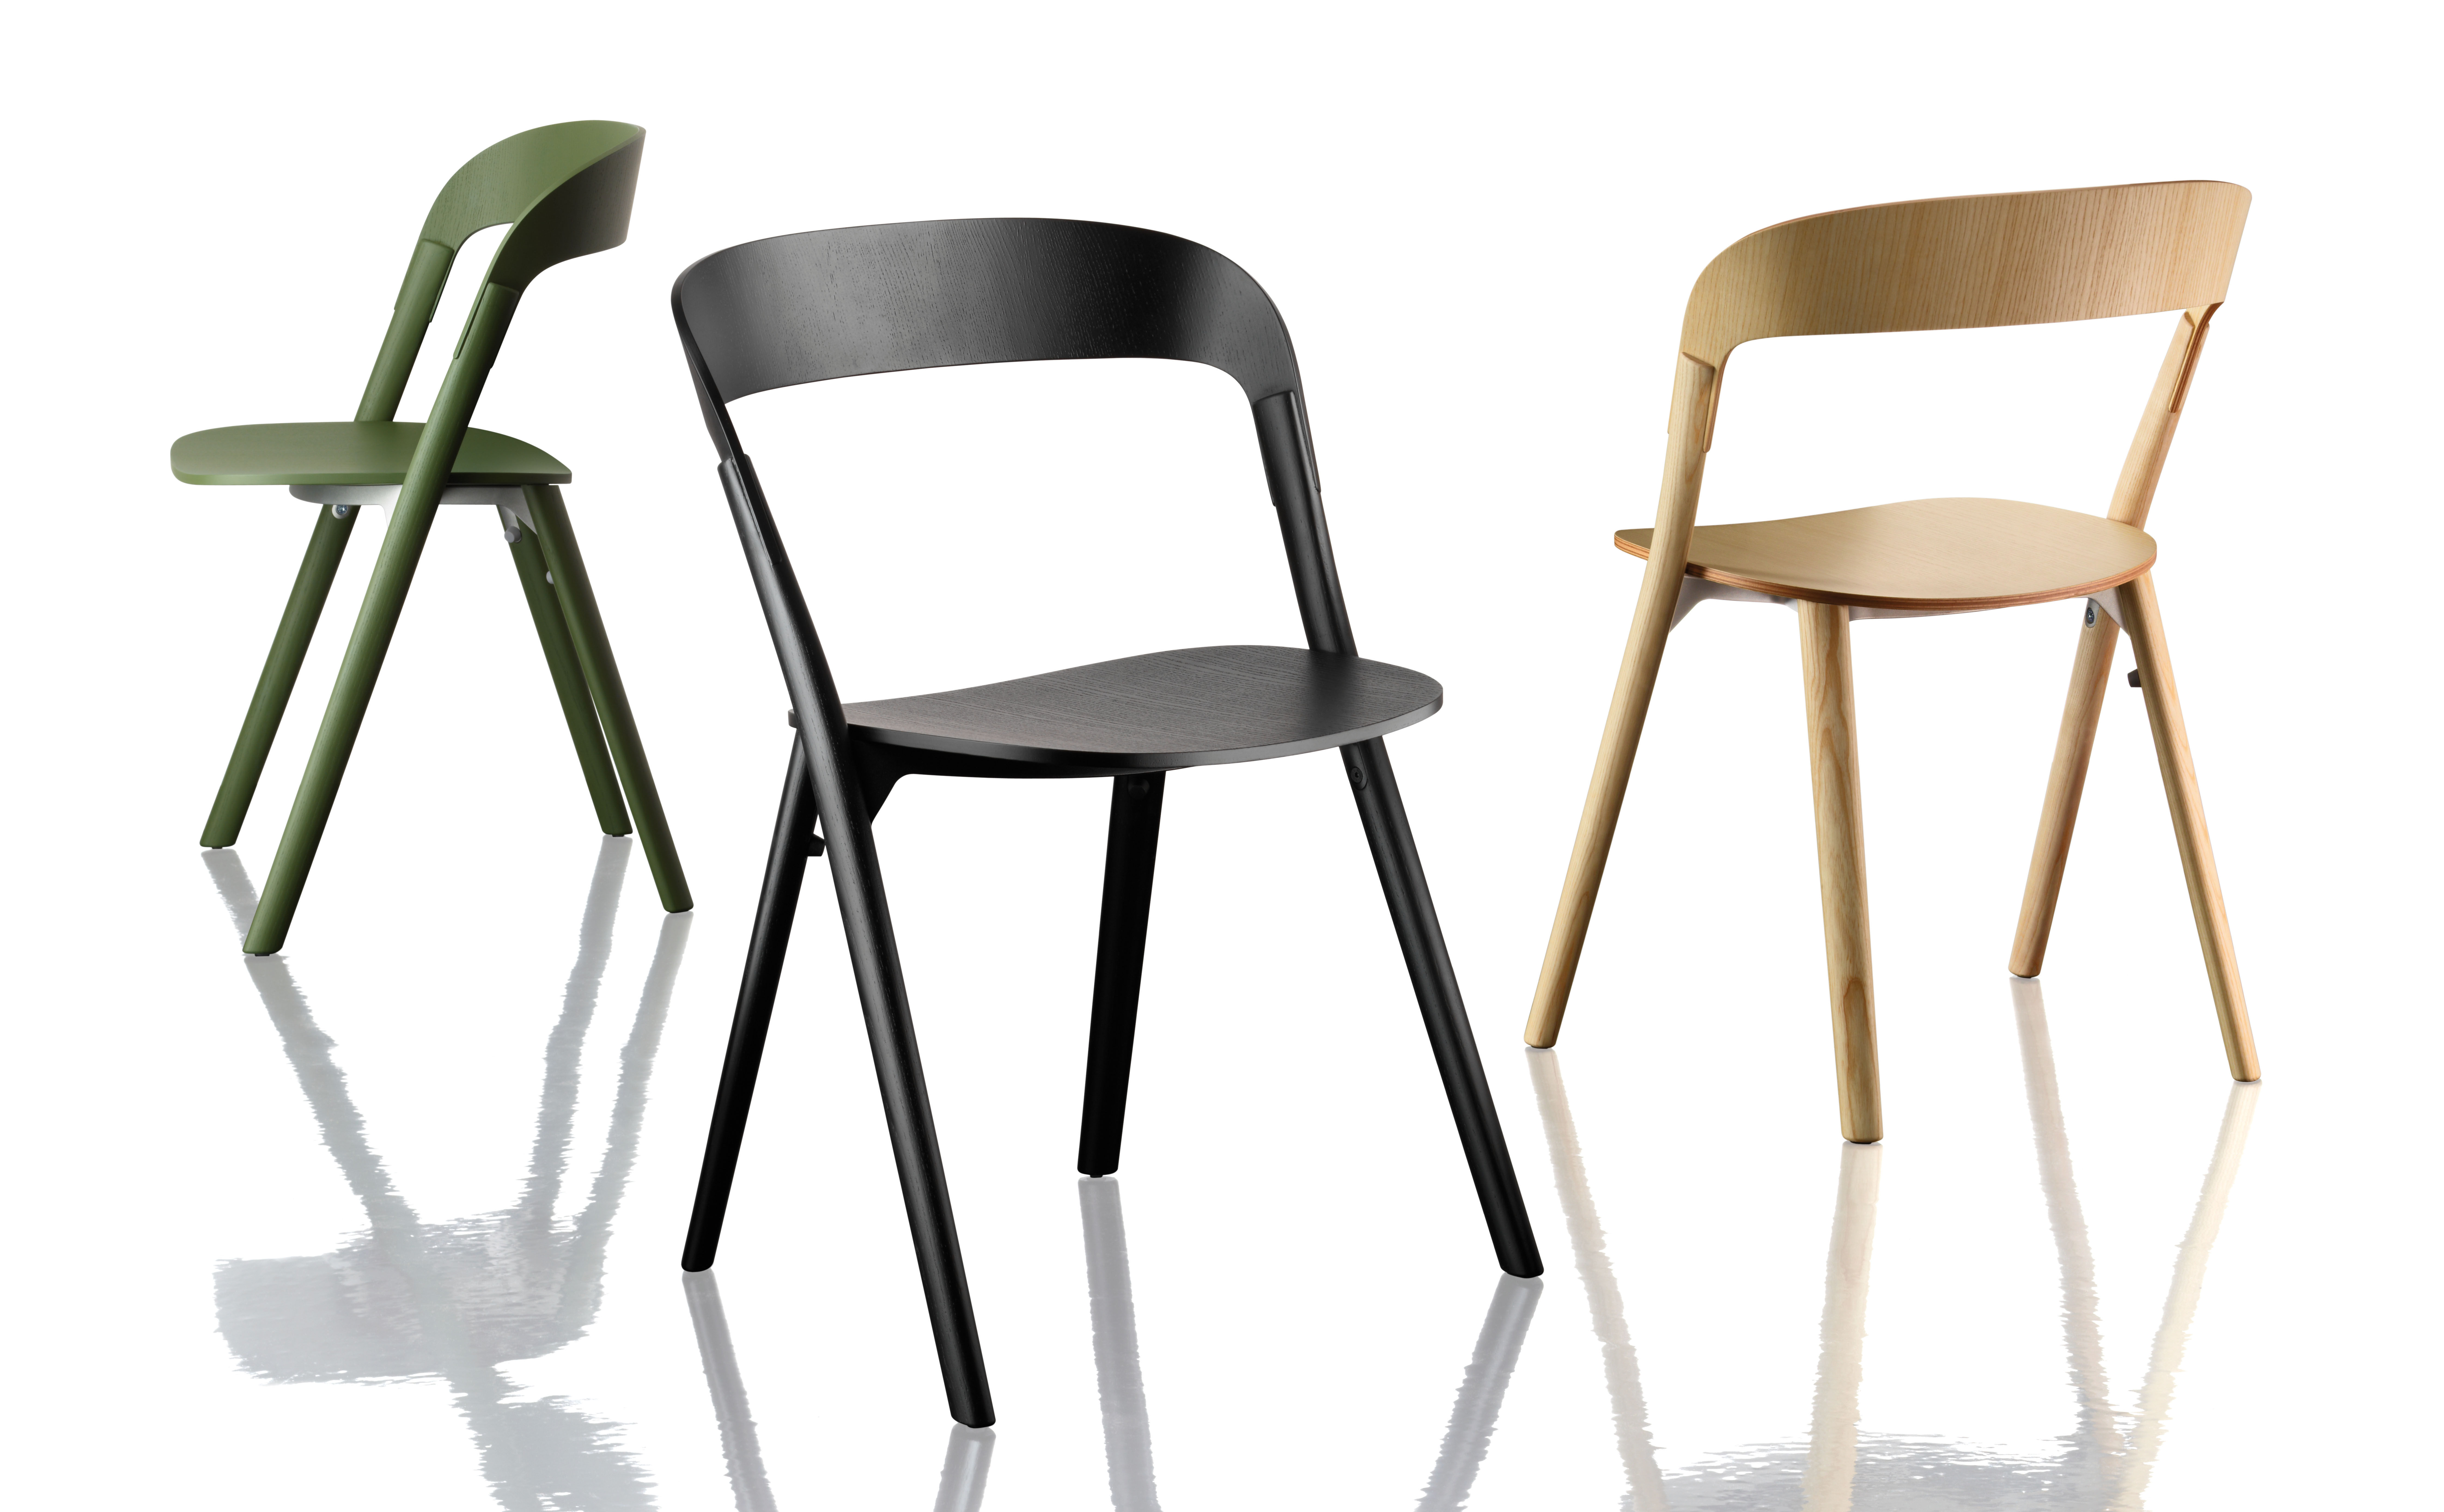 pila stackable chair wood black by magis. Black Bedroom Furniture Sets. Home Design Ideas